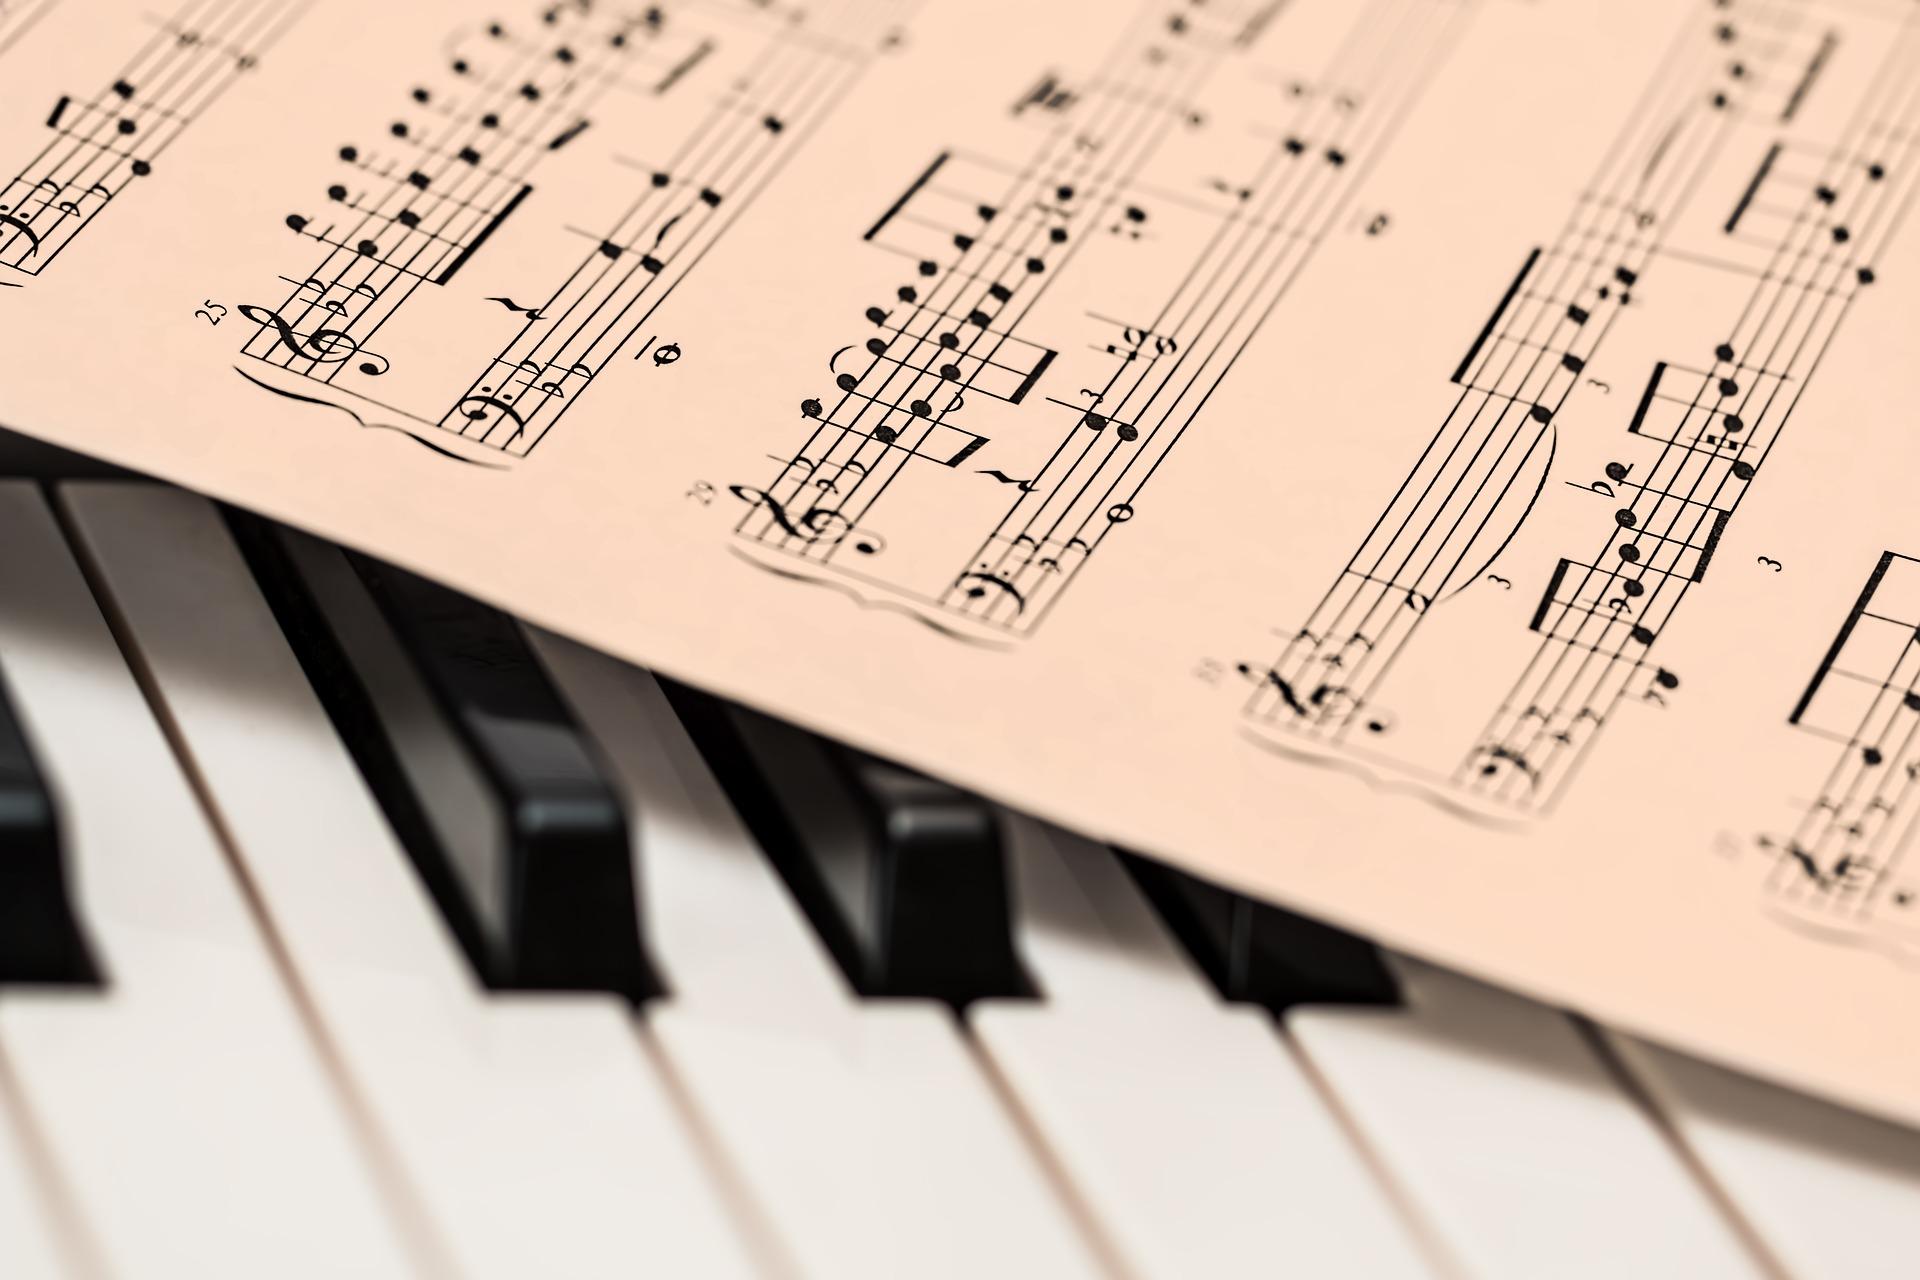 A piece of sheet music on piano keys.